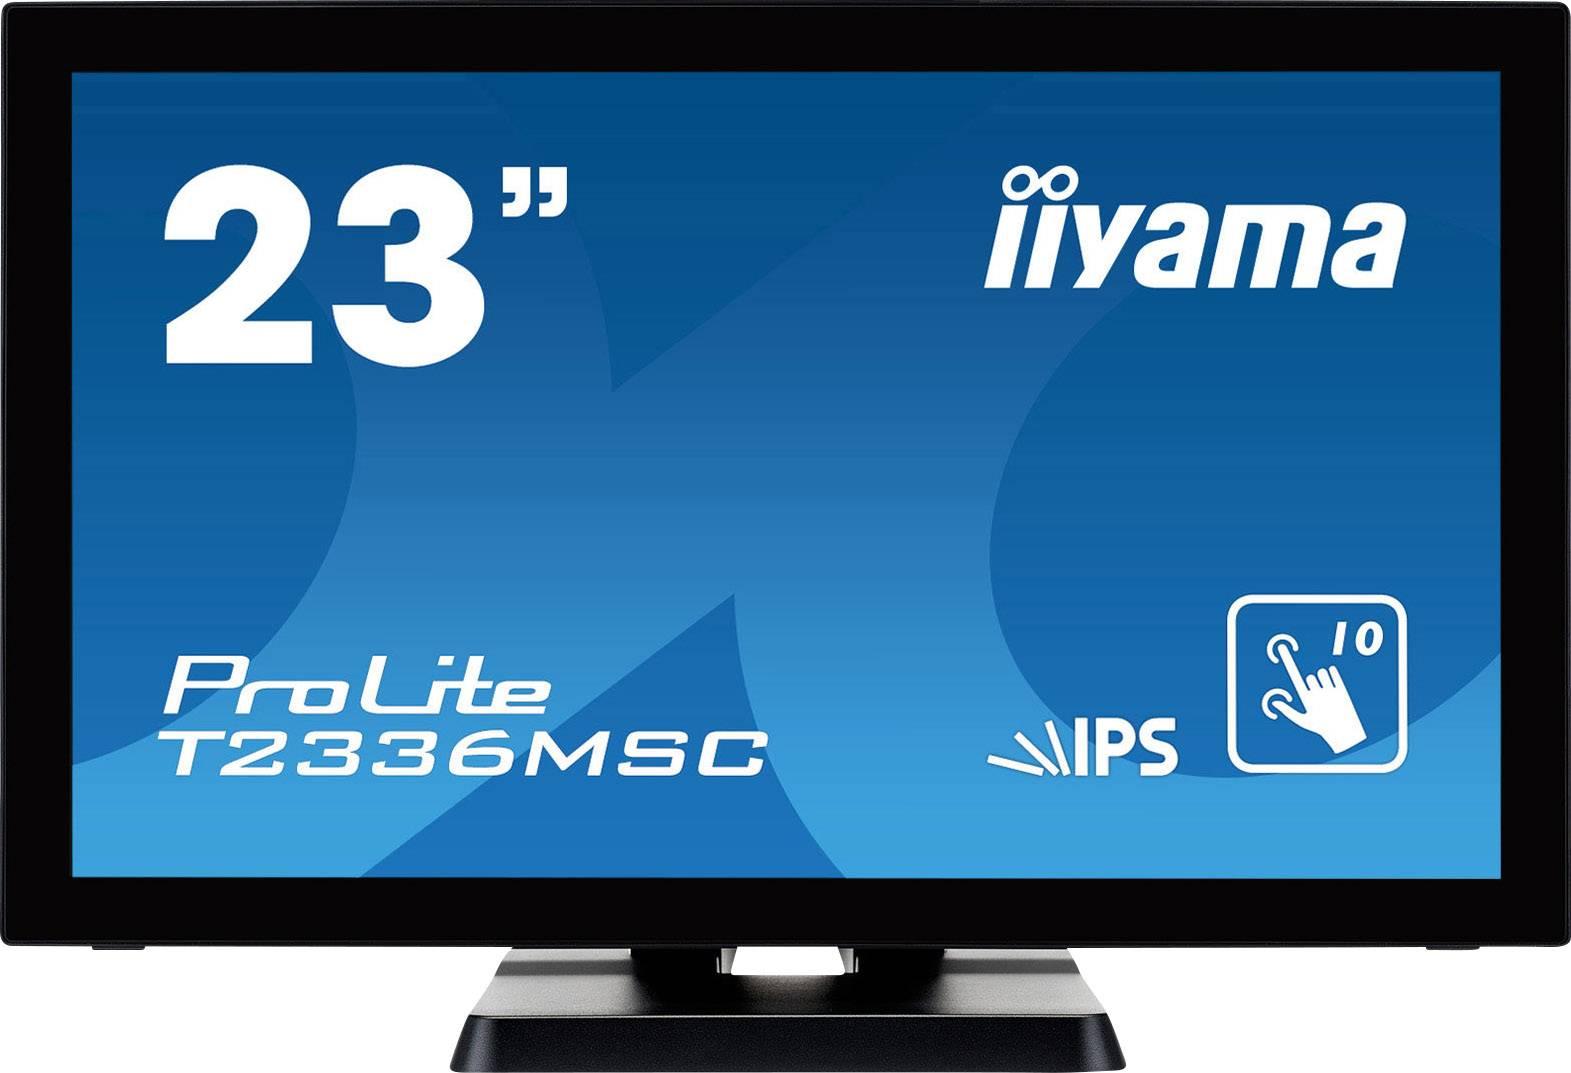 Iiyama T2336MSC-B2 Monitor touch sc